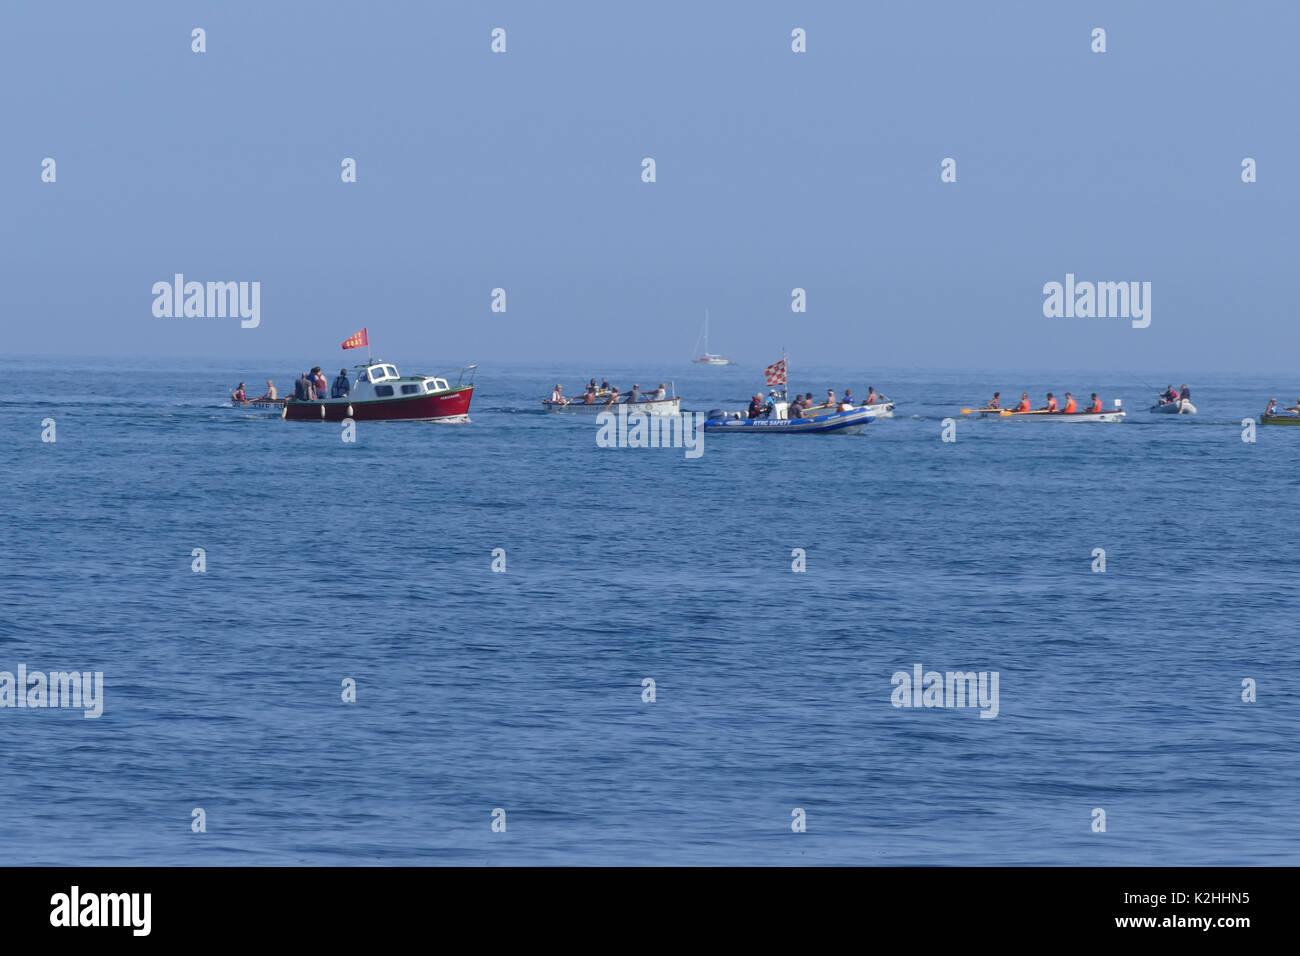 Shaldon regatta 2017  seine boat racing - Stock Image